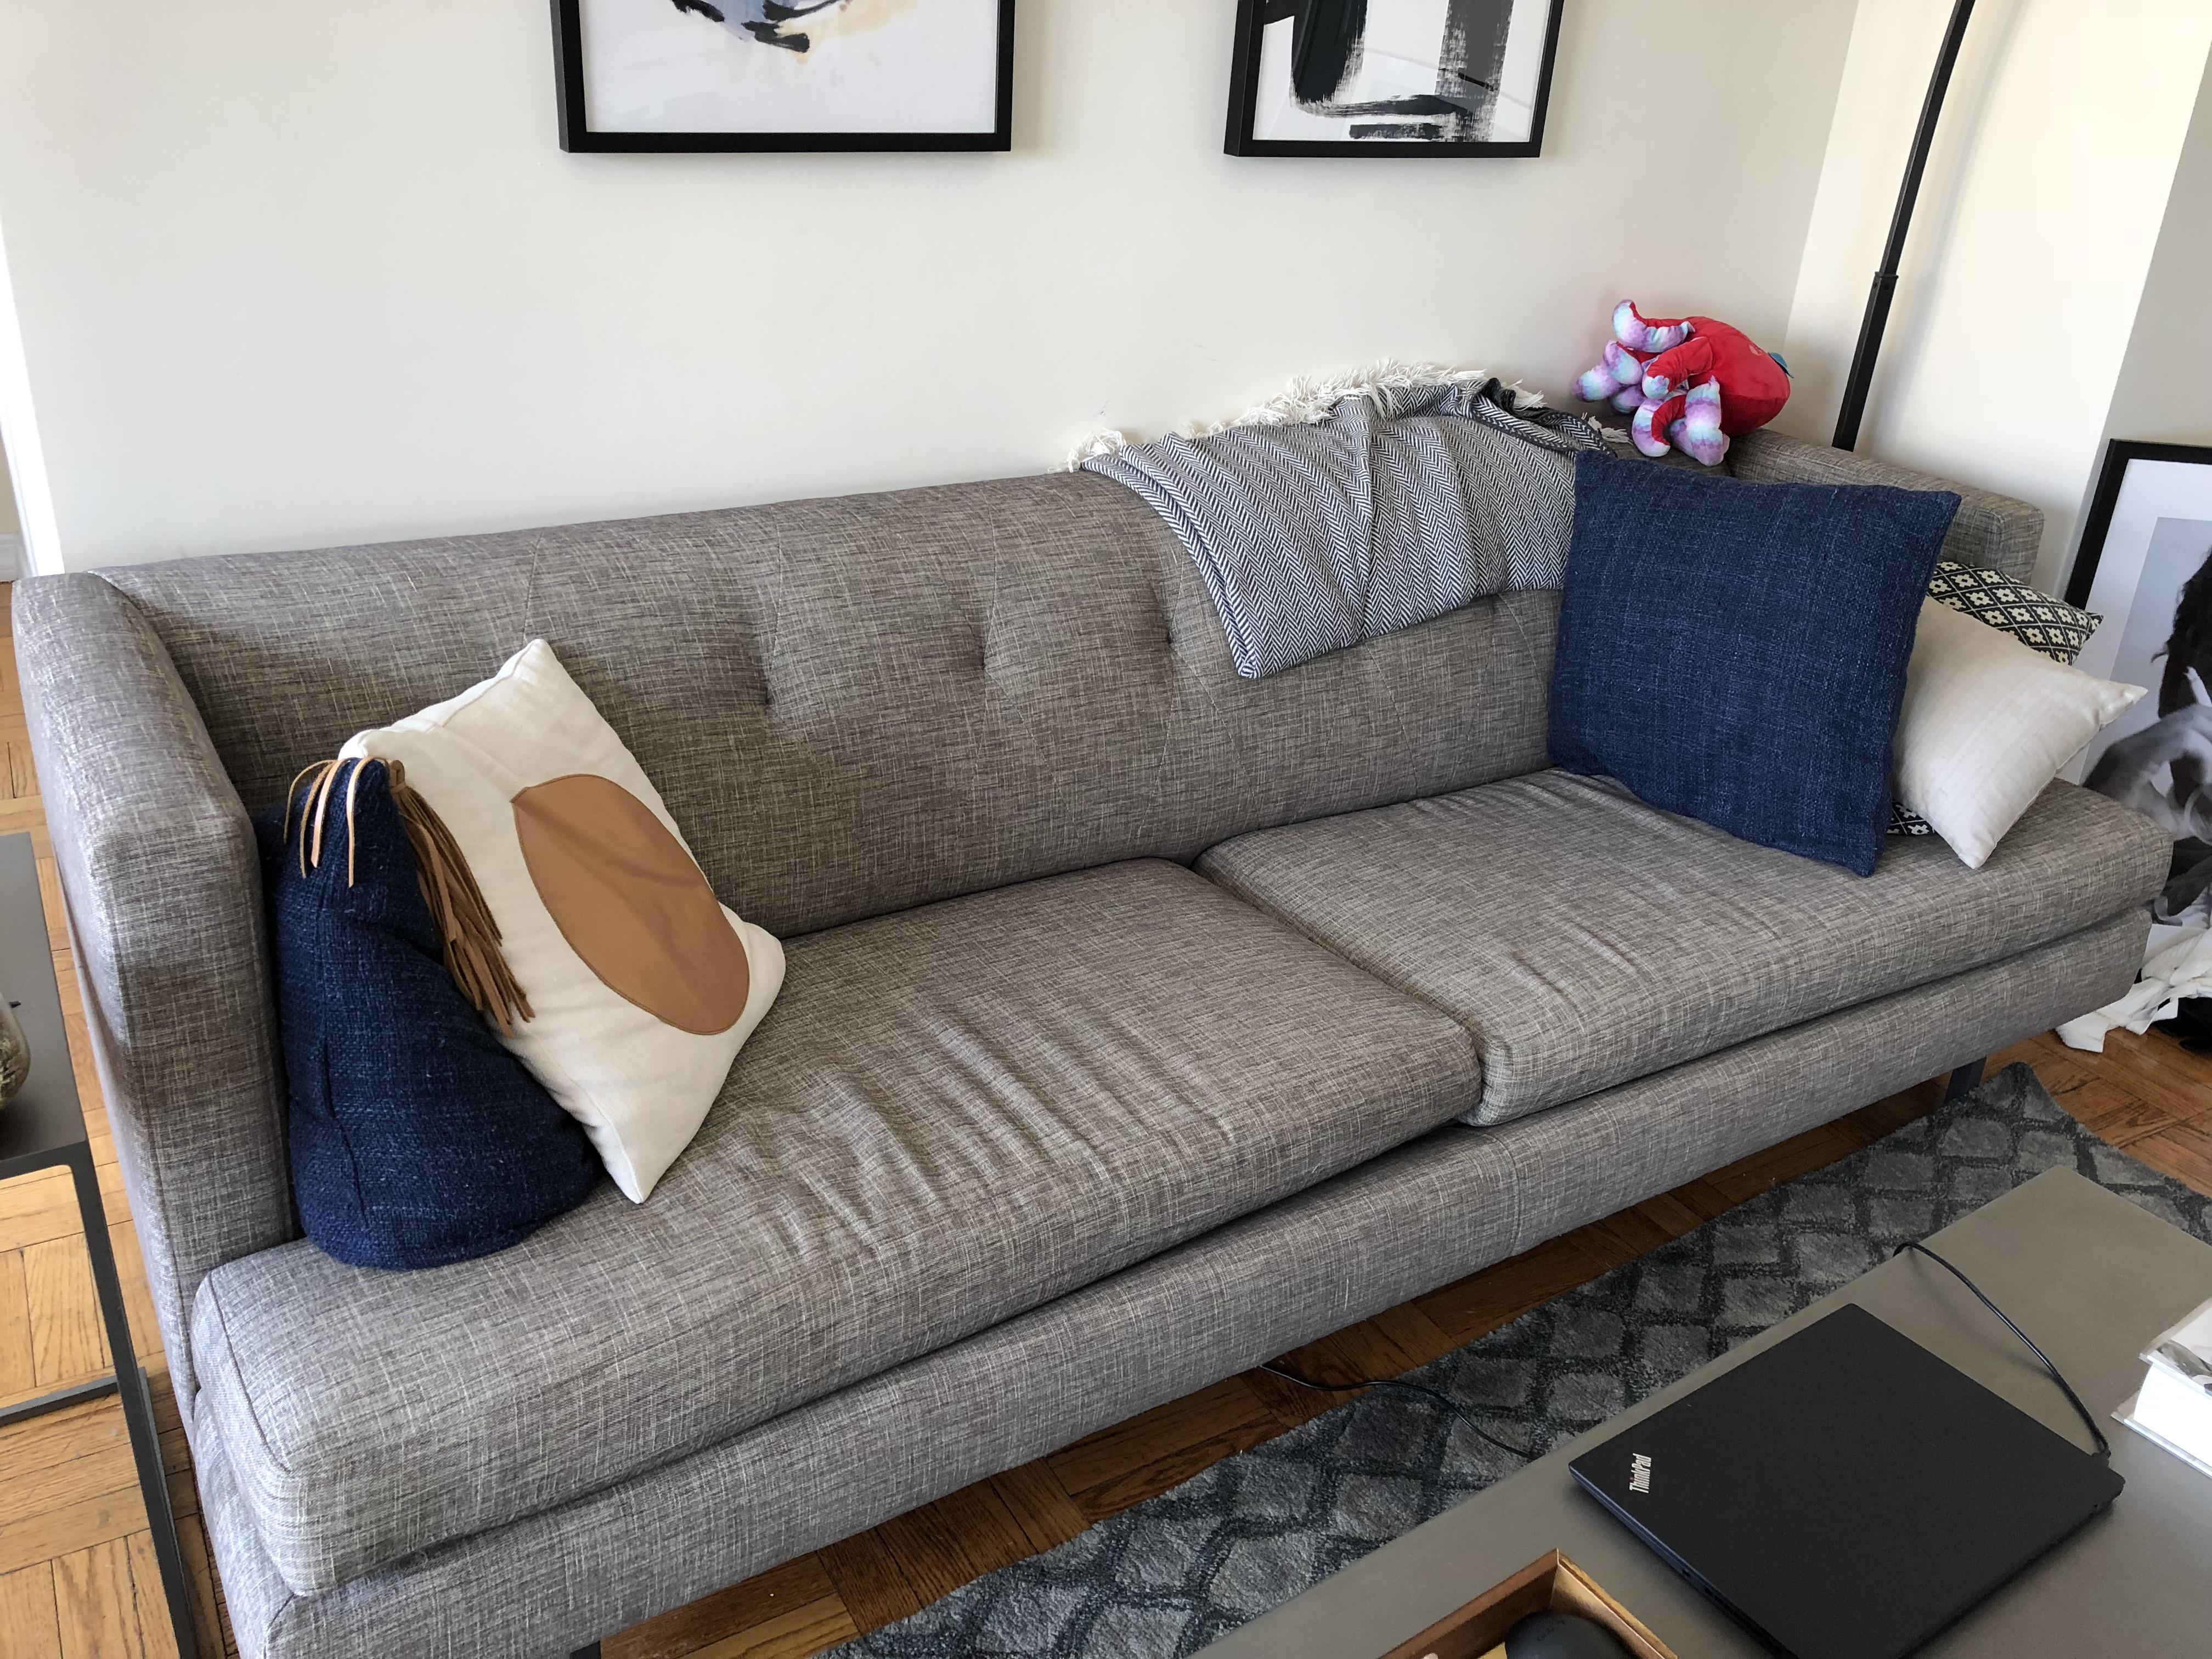 Astounding Cb2 Avec Grey Sofa W Brushed Stainless Steel Legs Creativecarmelina Interior Chair Design Creativecarmelinacom